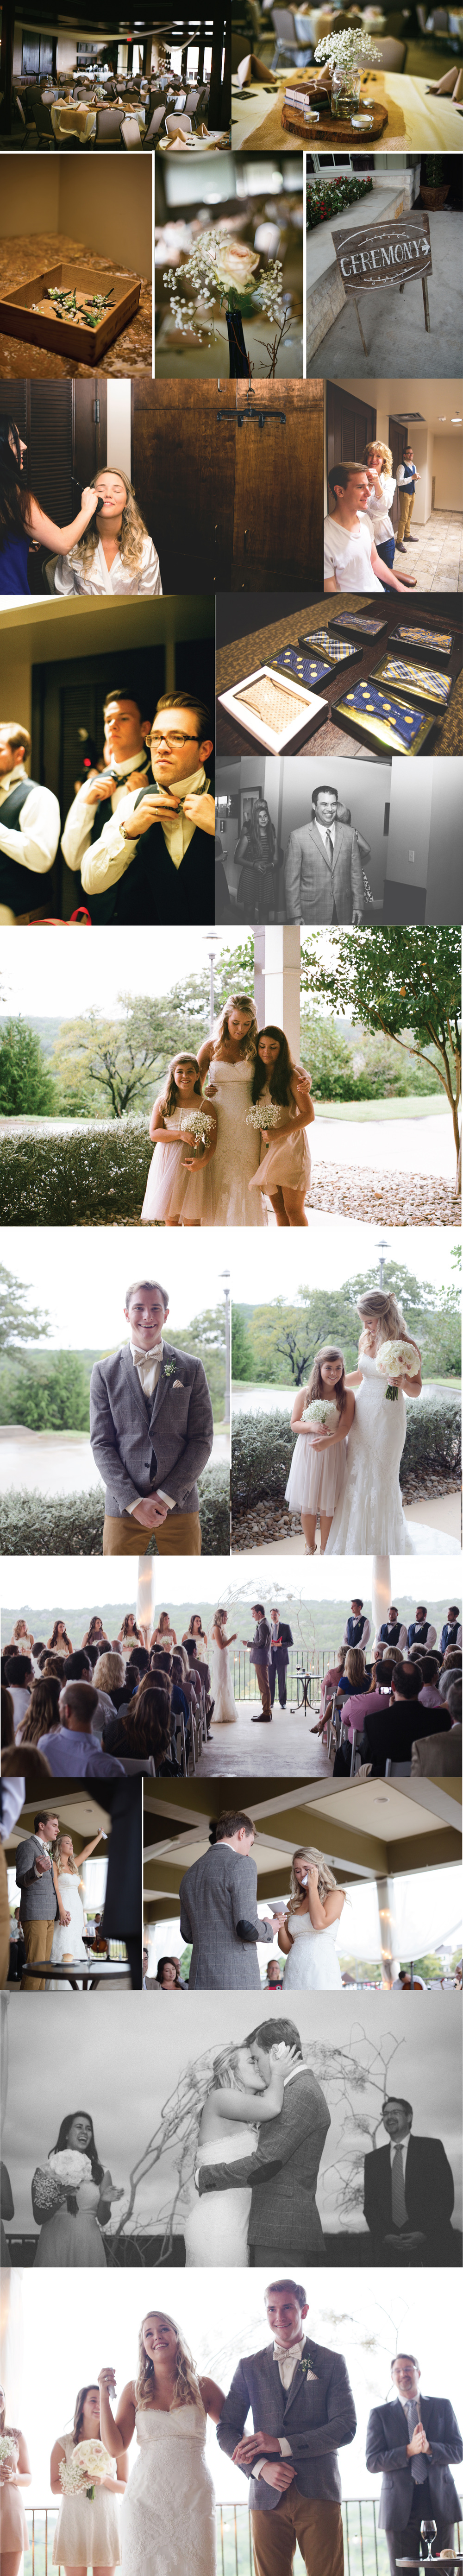 Metcalfe-WeddingPart1sized.jpg